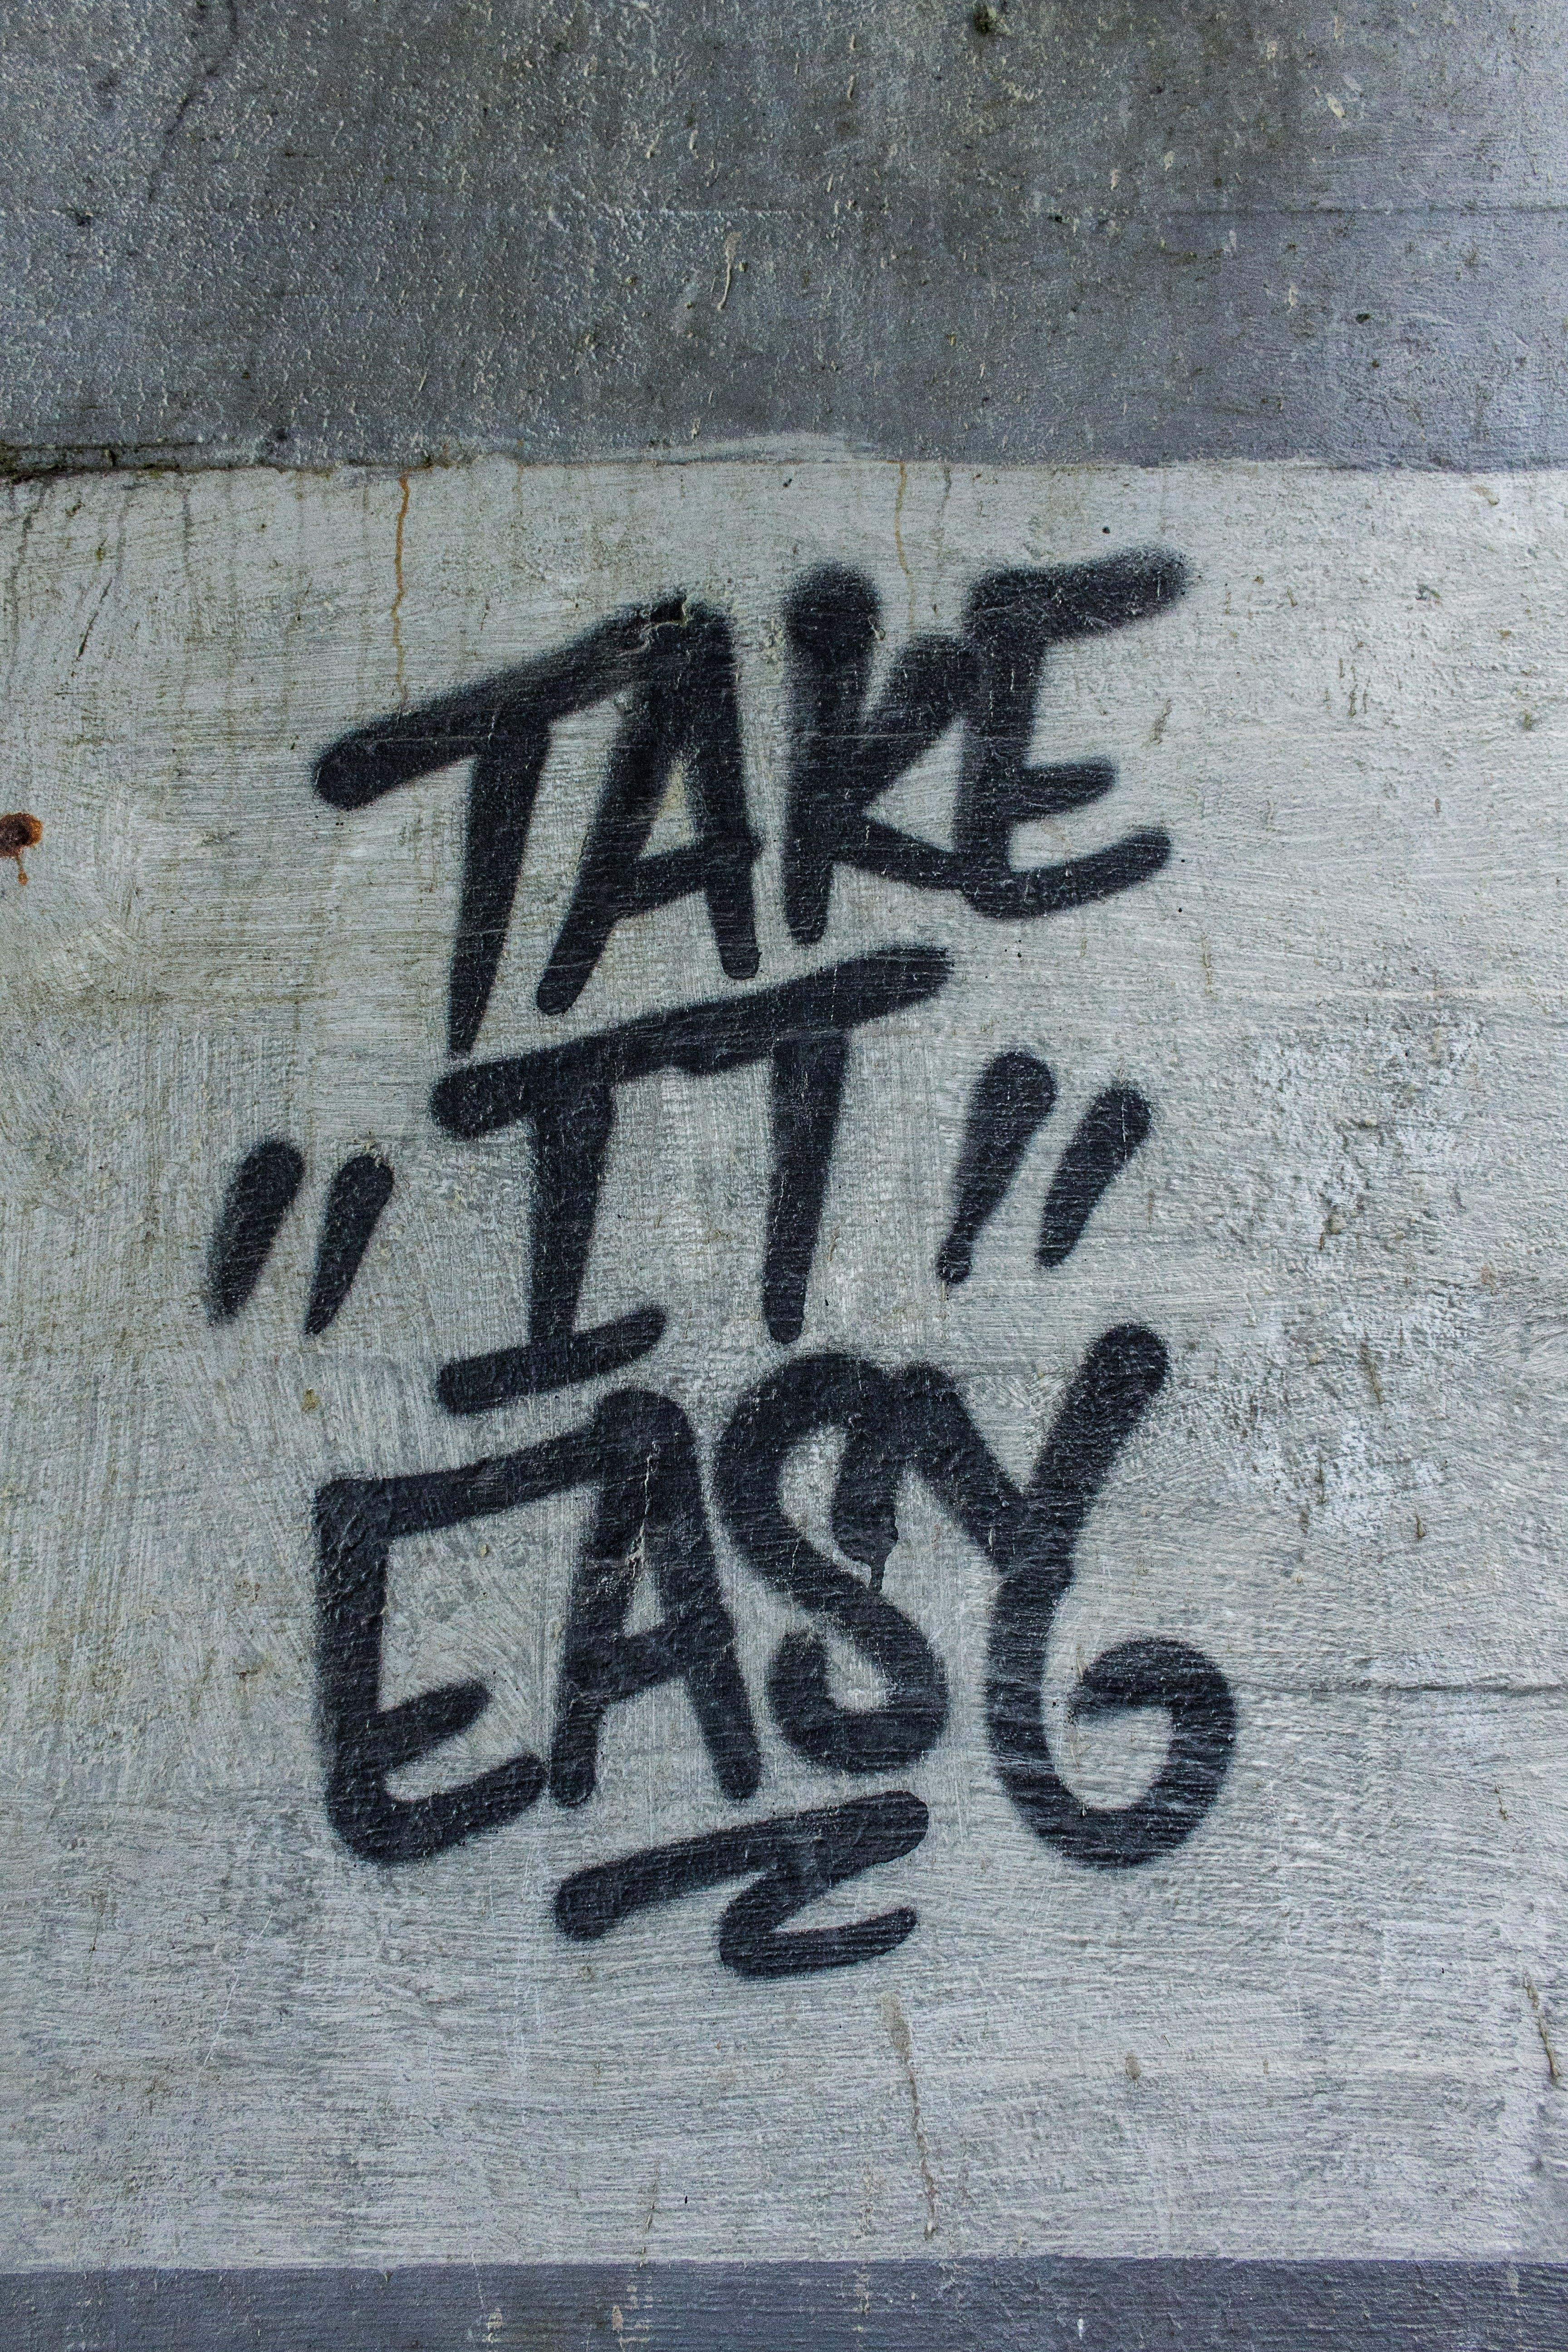 Kostnadsfri bild av betong, gata, graffiti, kommunikation